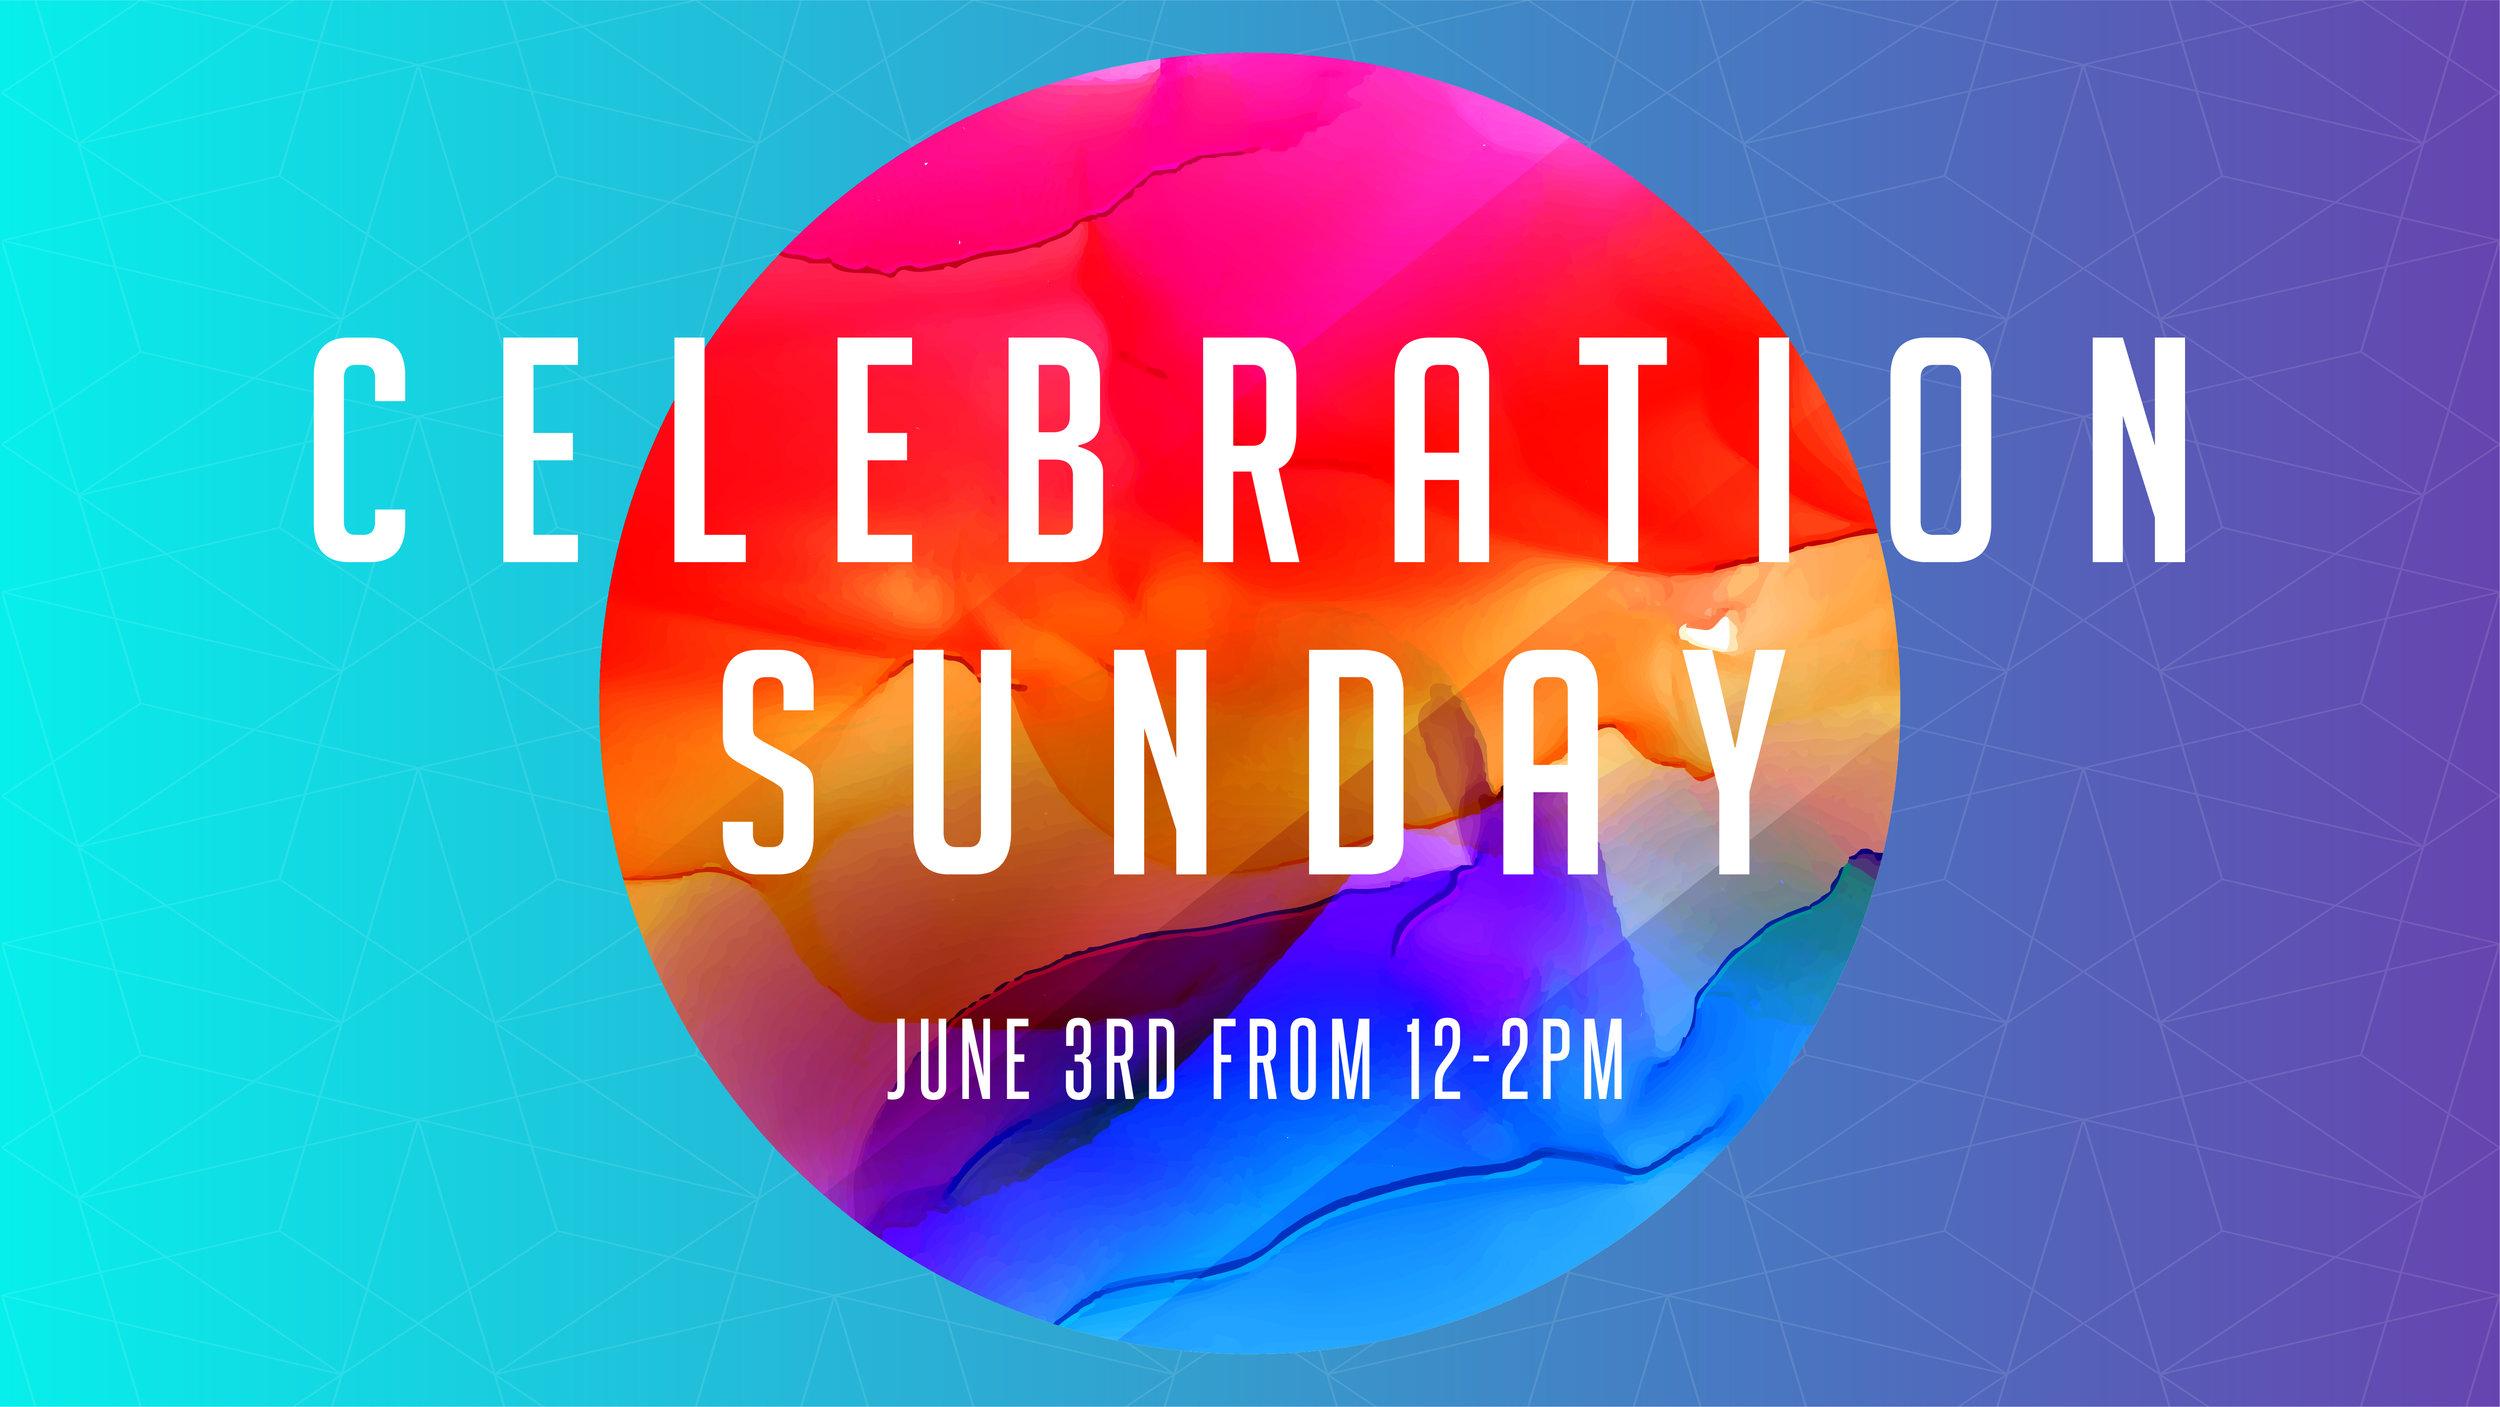 2018-04-20 - Celebration Sunday1.jpg